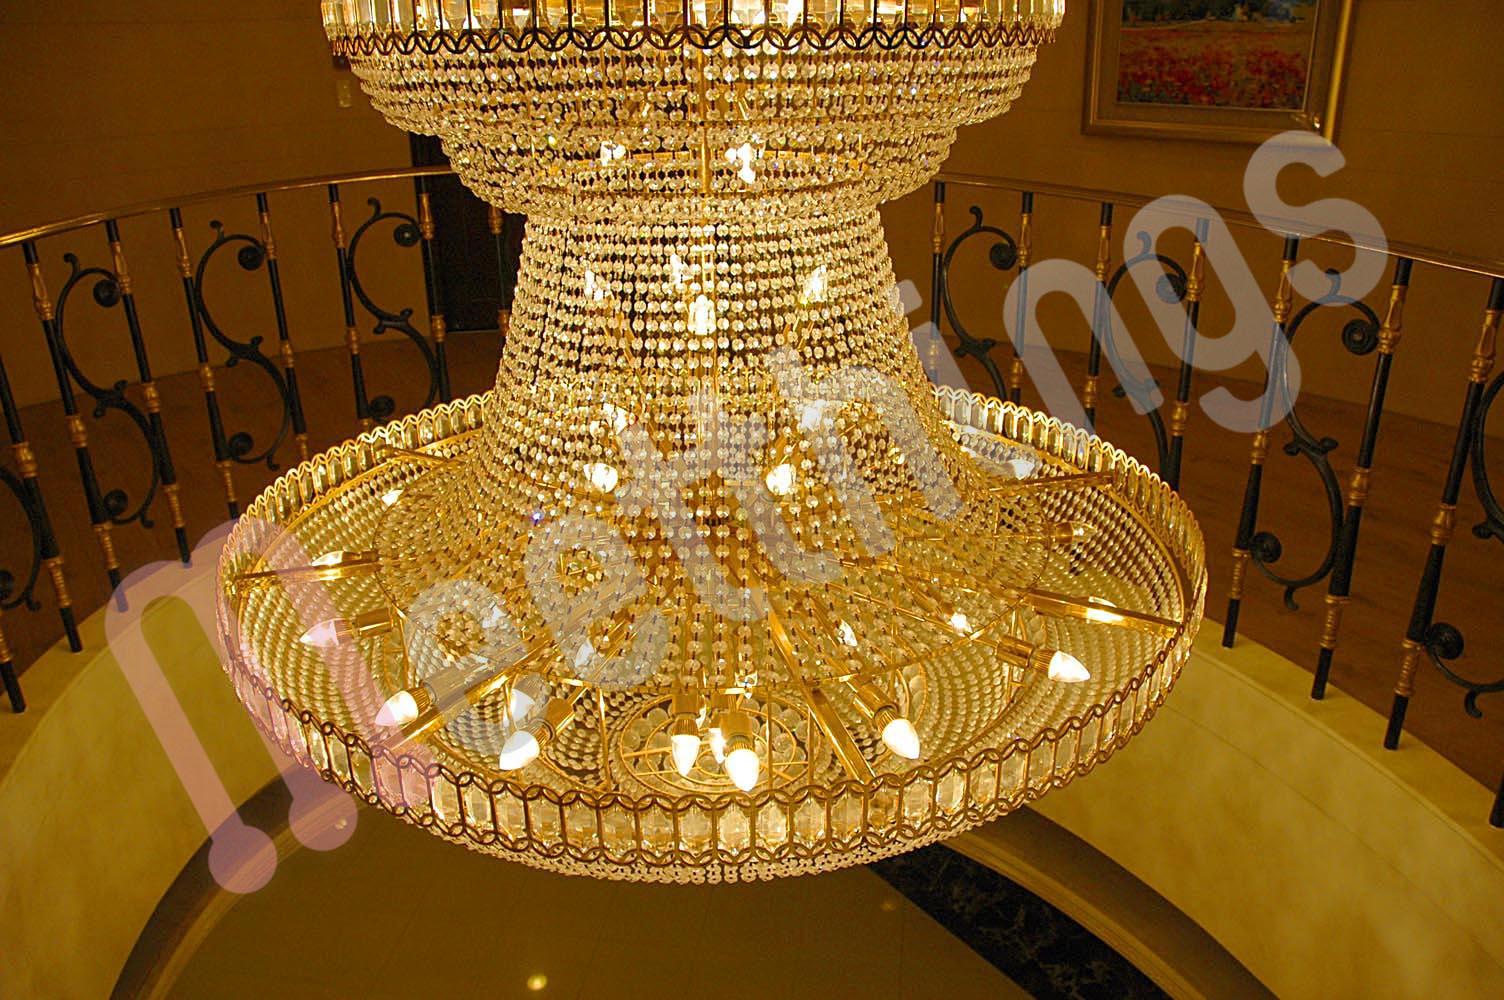 L mparas ara a con leds blog meetthings art culos sobre leds de venta en nuestra tienda - Lamparas de arana de cristal ...